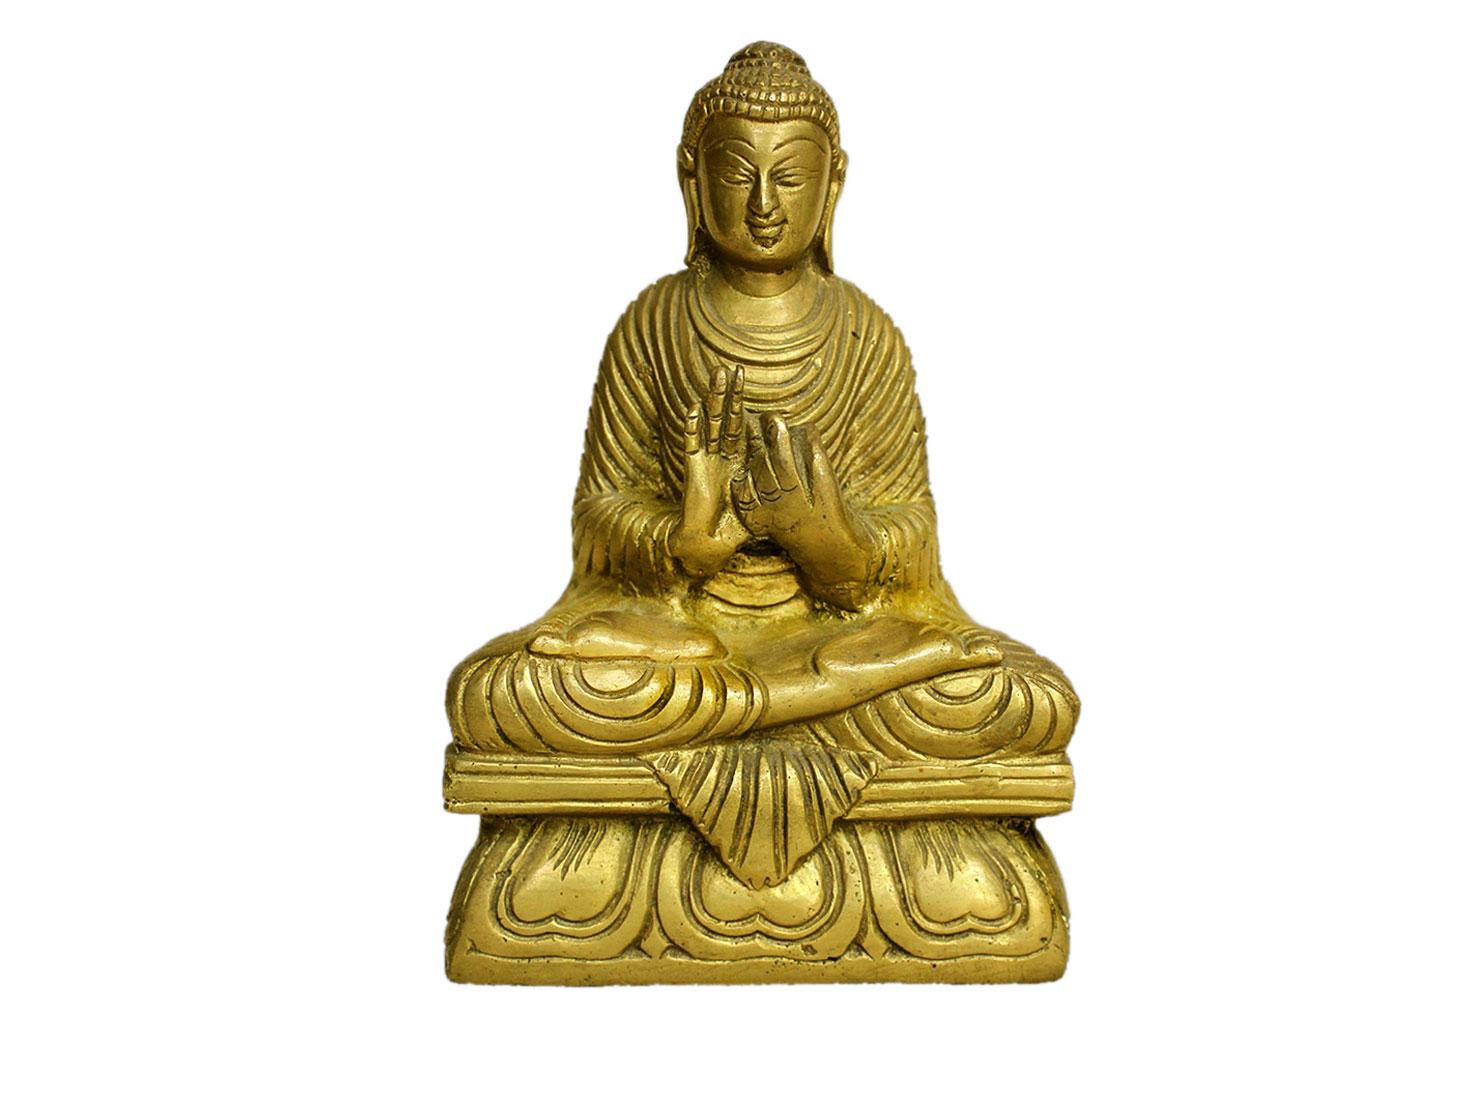 Brass Buddha (Ht-5.9 Inches)